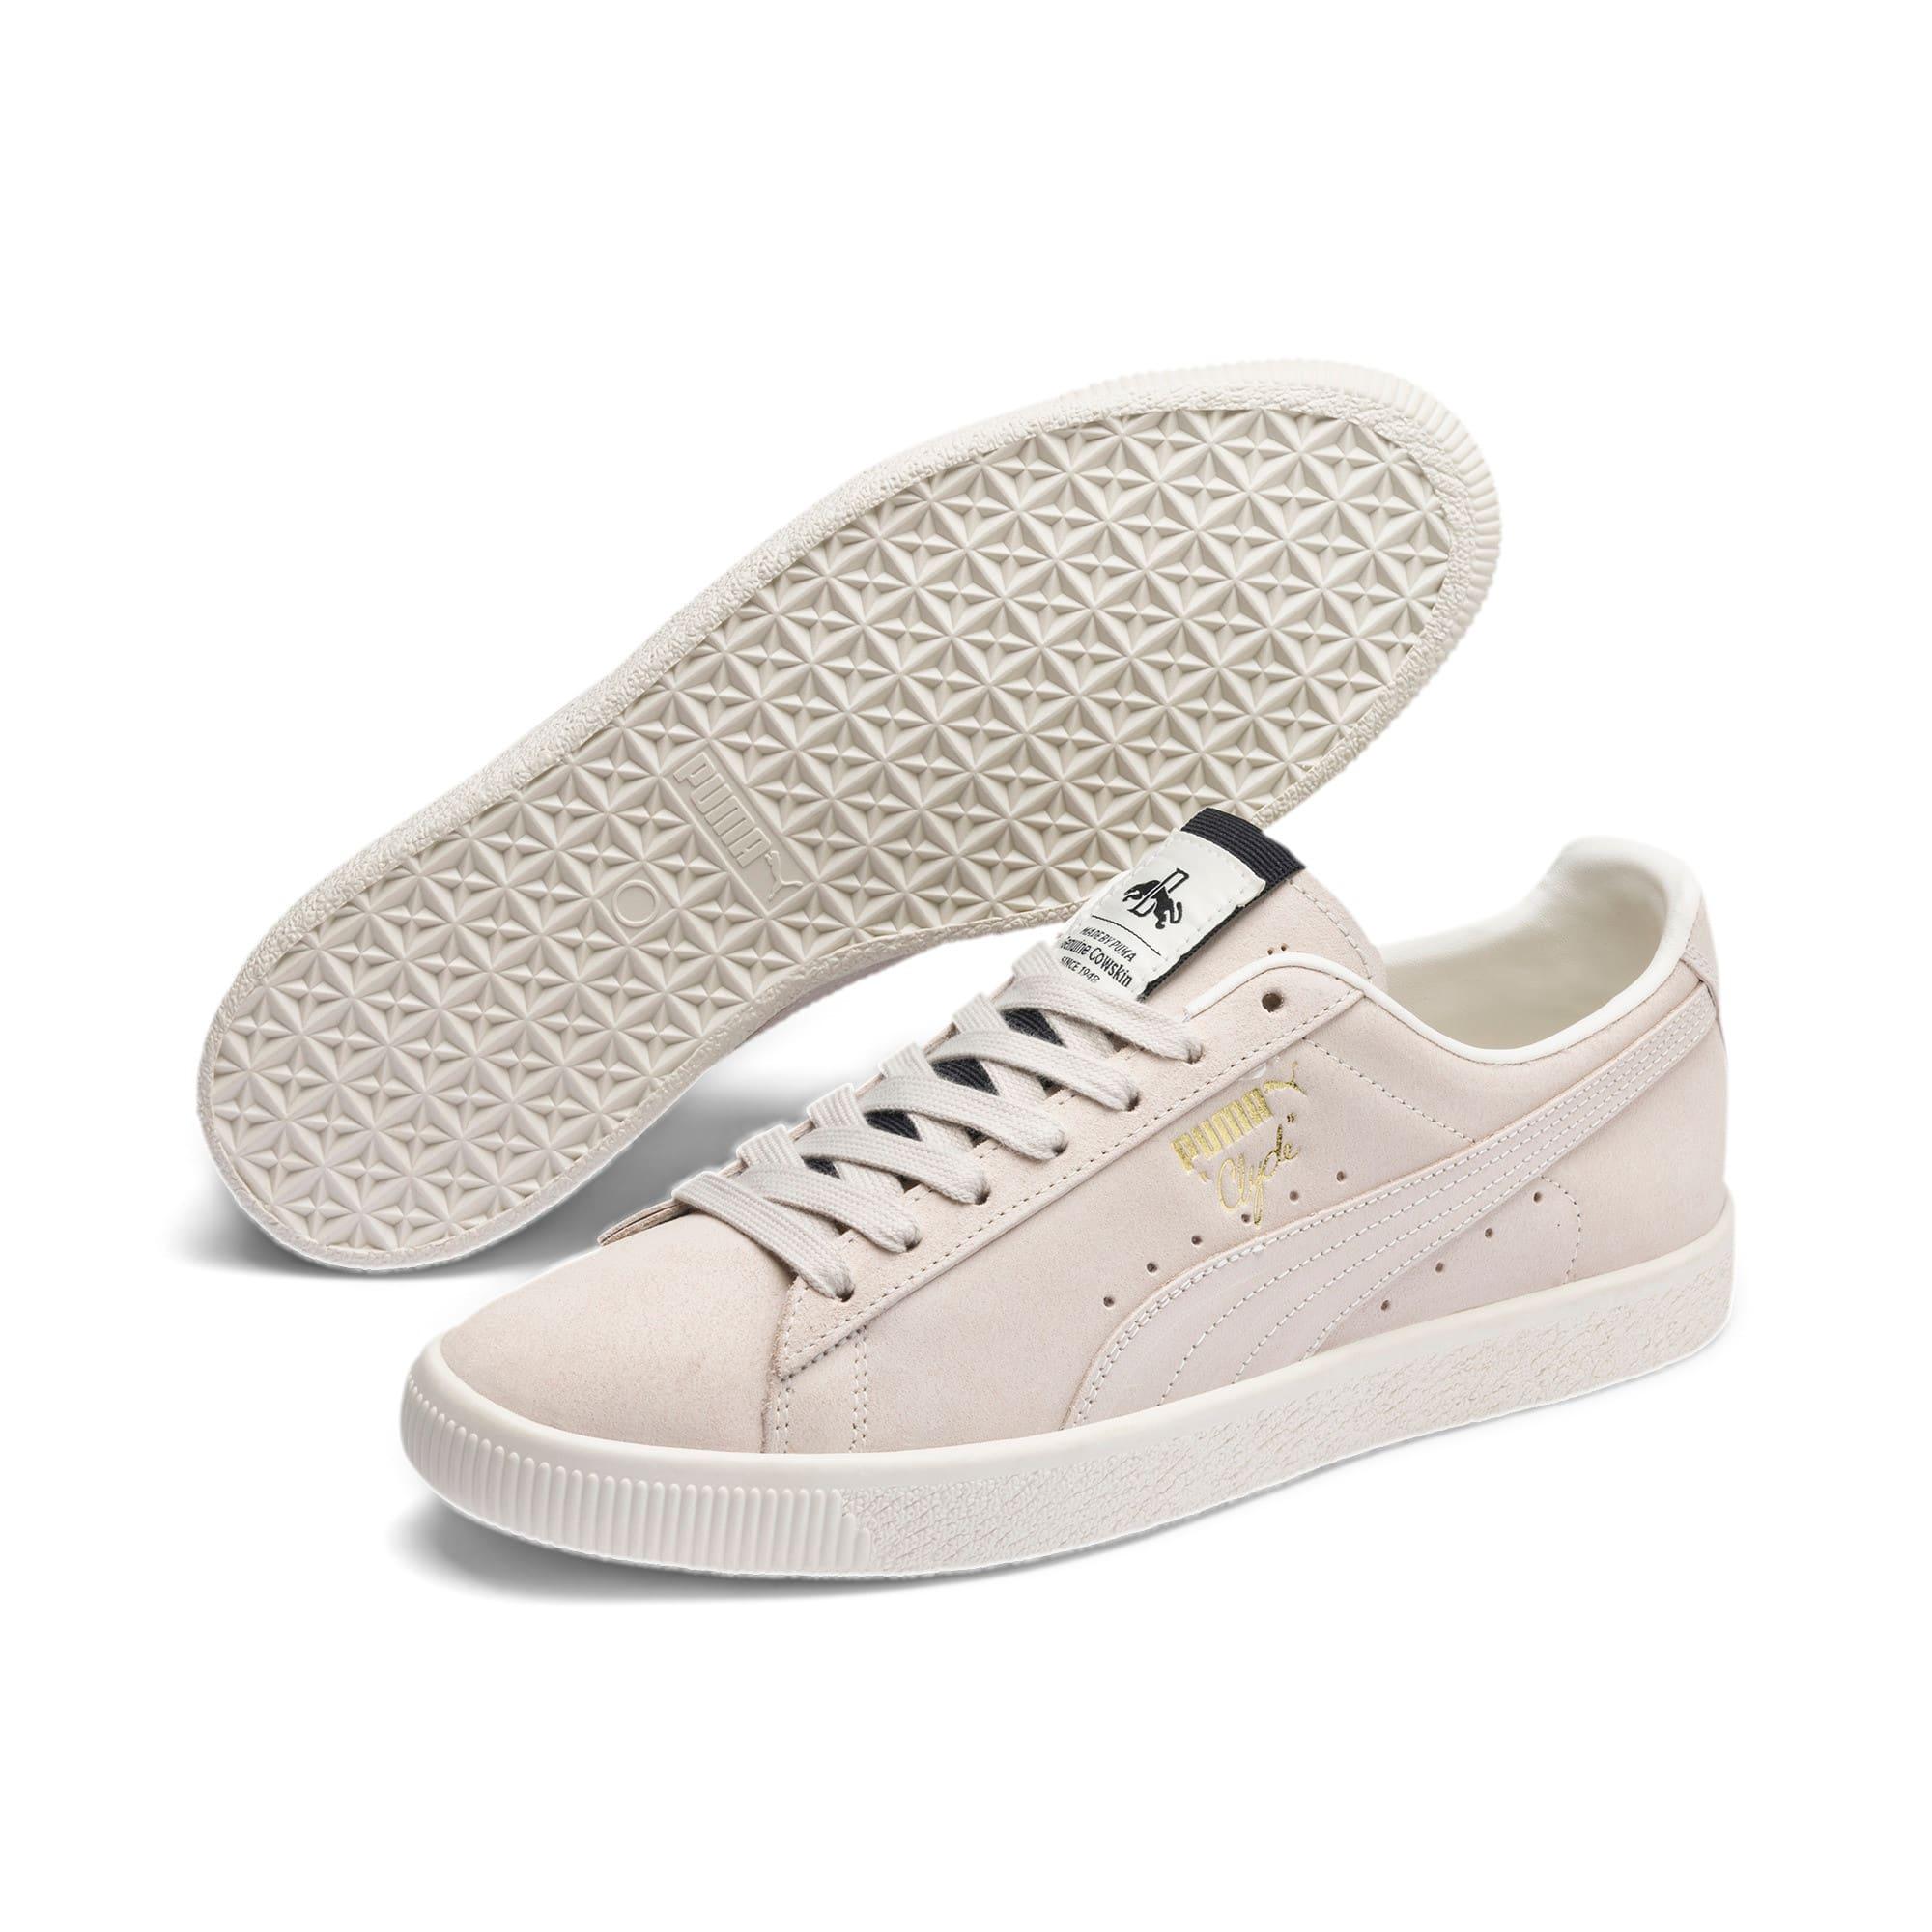 Thumbnail 2 of Clyde Fedora Sneakers, Whisper Wht-P Blk-WhisperWht, medium